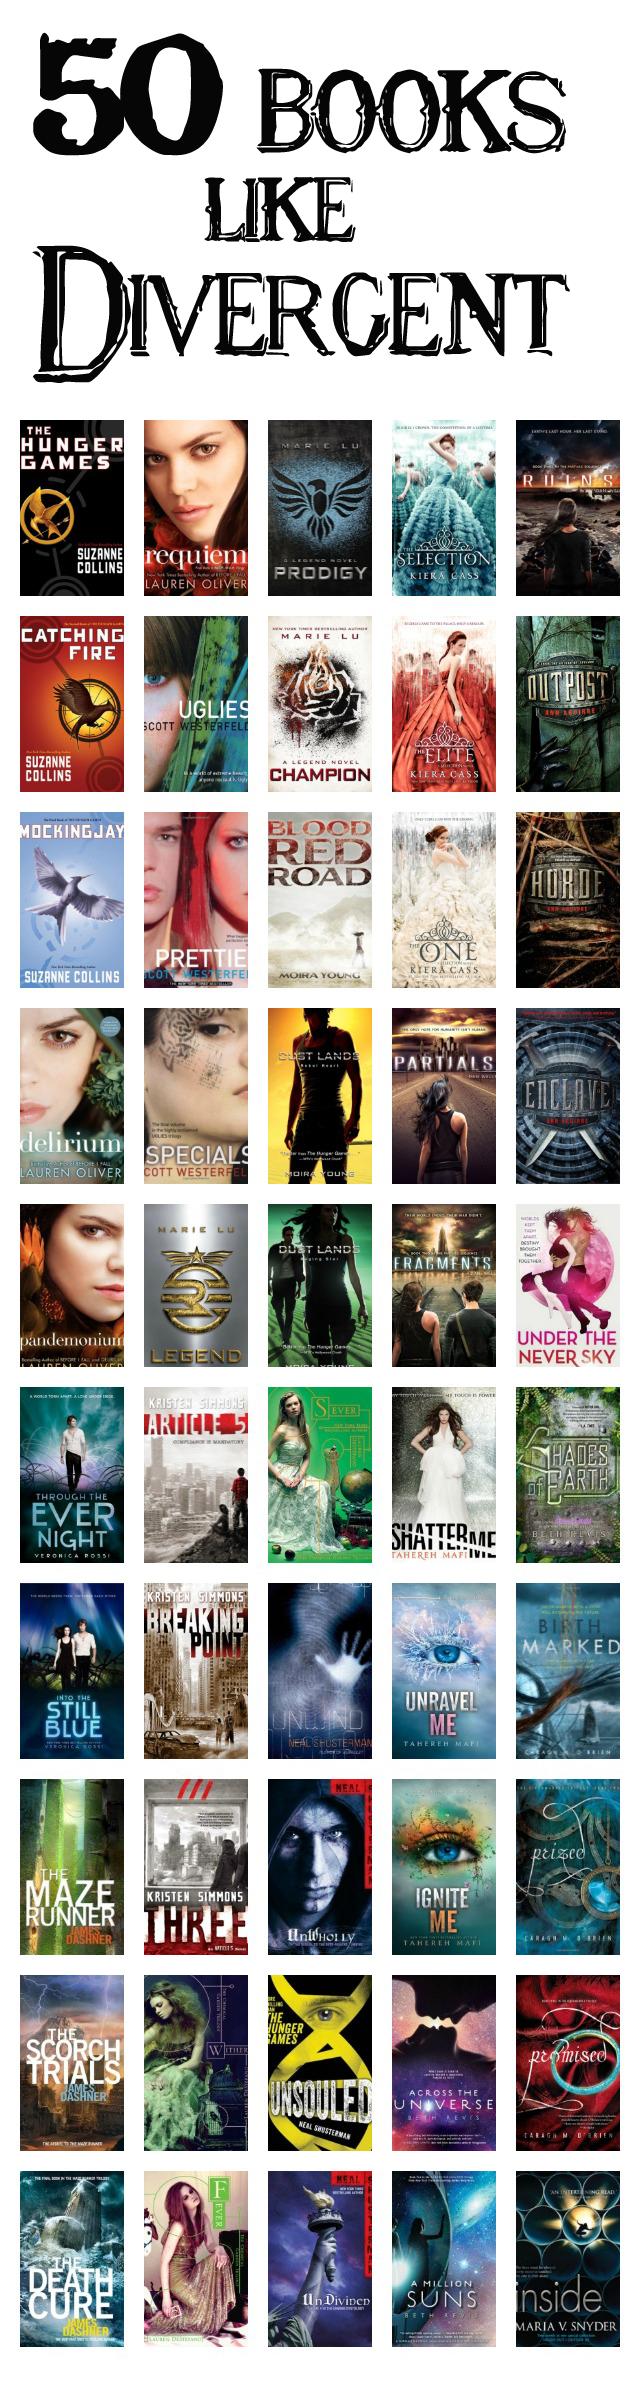 50 Books Like Divergent http://www.xxchromosomes.com/2014/03/50-books-like-divergent.html